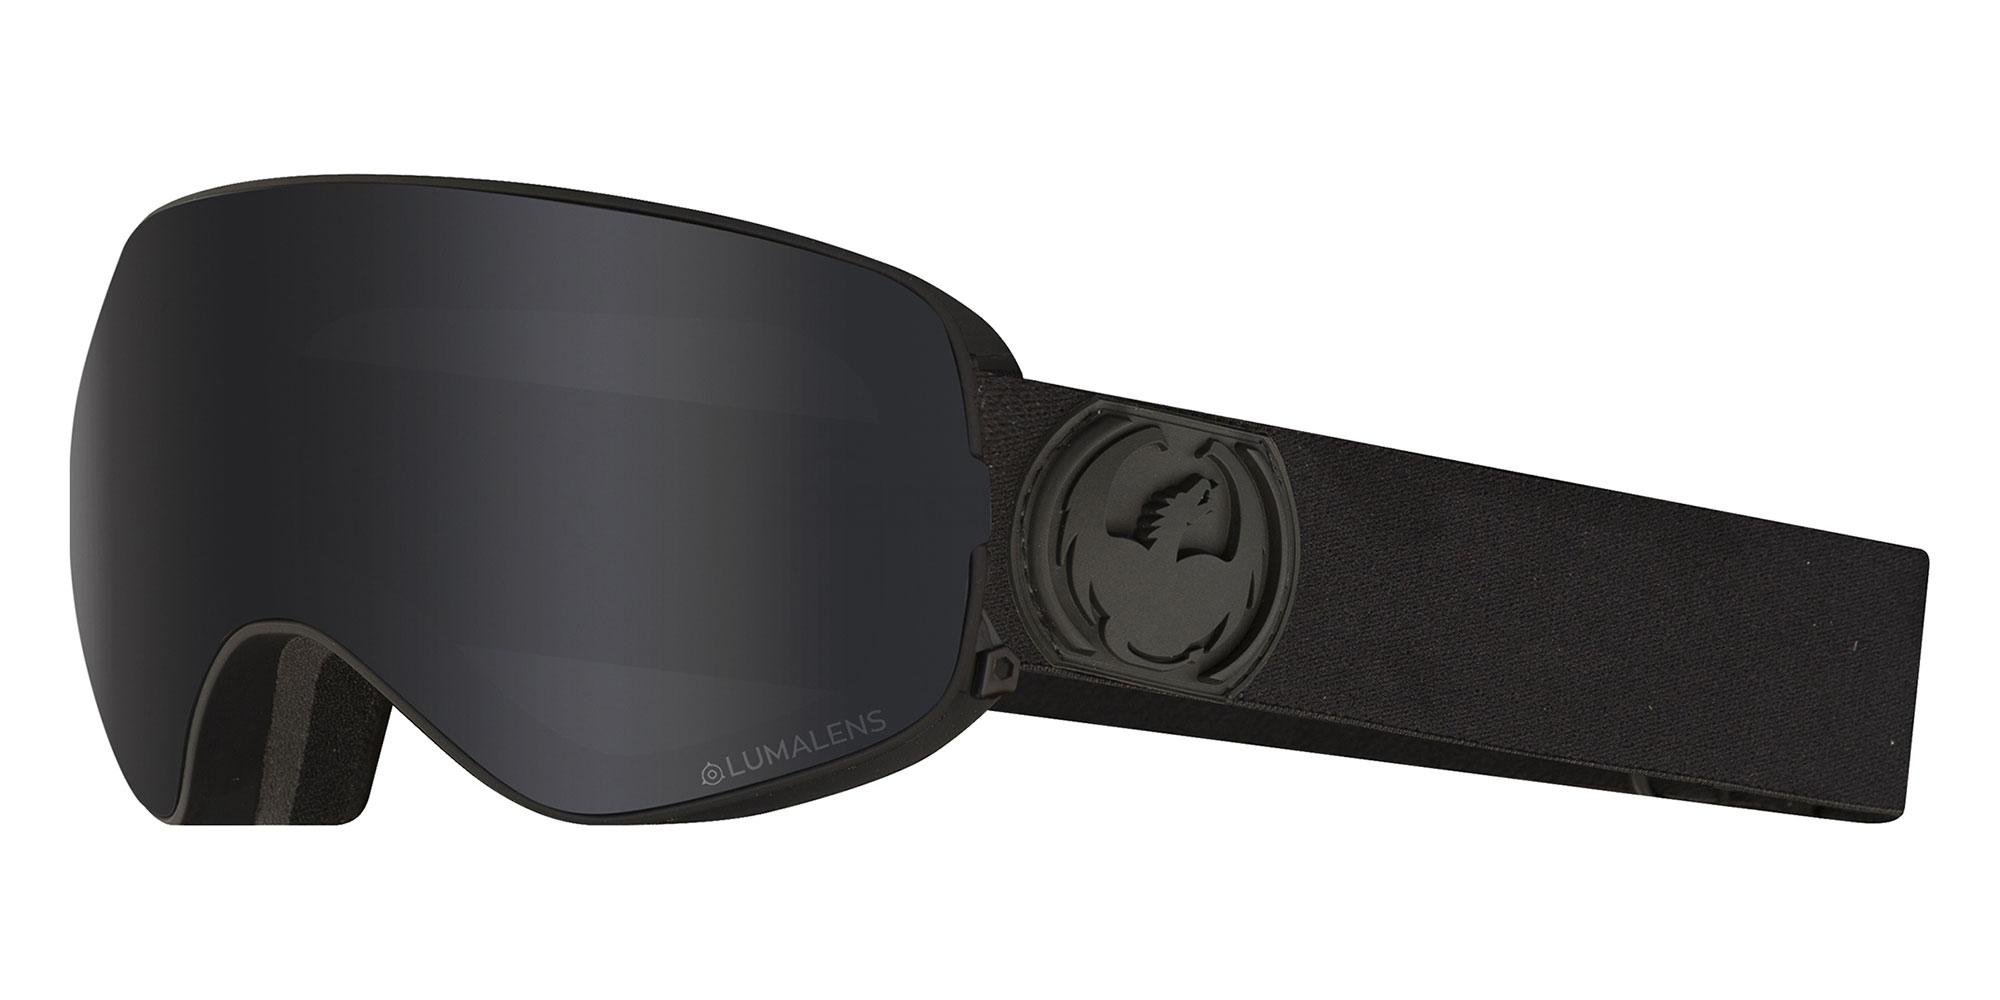 331 DR X2S 1 Goggles, Dragon